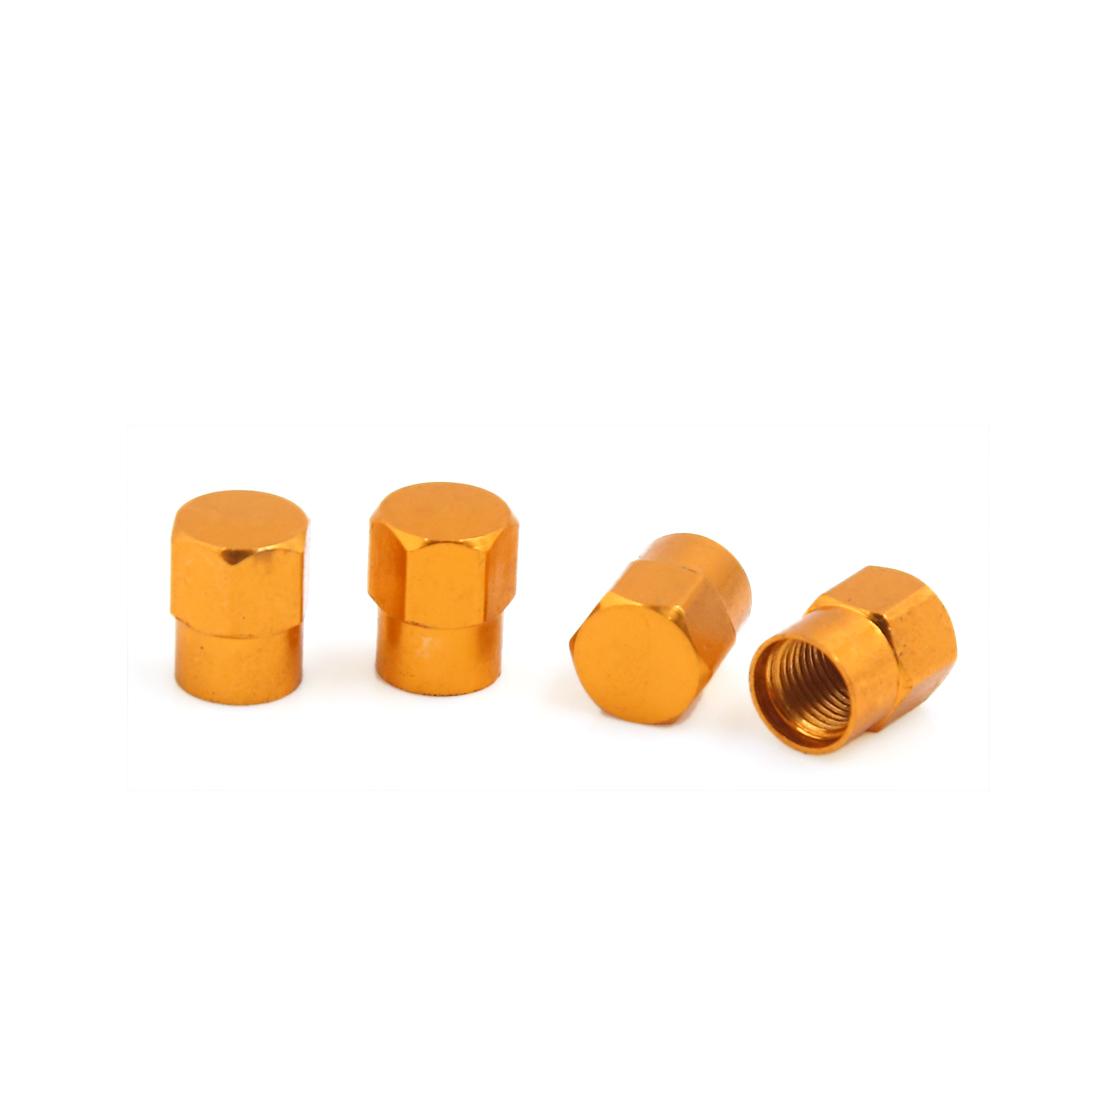 4Pcs Orange Car Motorcycle Wheel Tyre Tire Valve Stem Air Dust Cover Cap